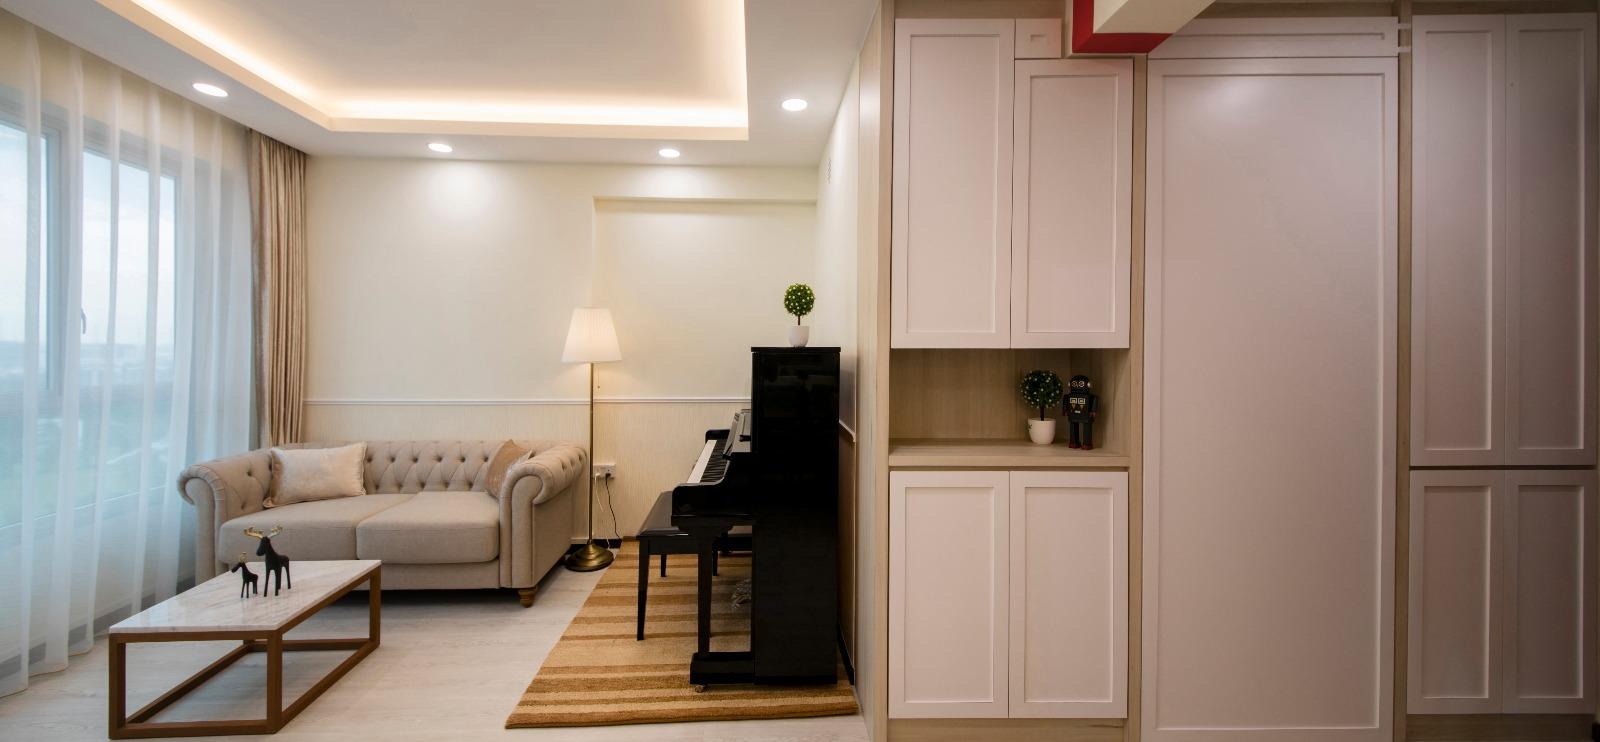 Residential Interior Design – Starry Homestead Singapore